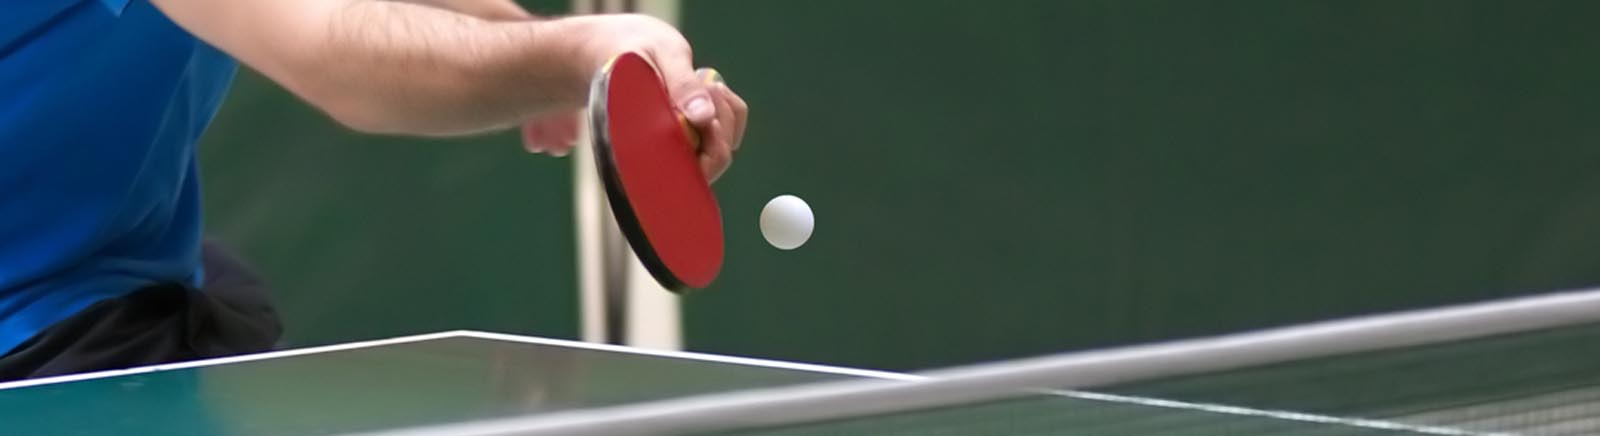 Tischtennis post image